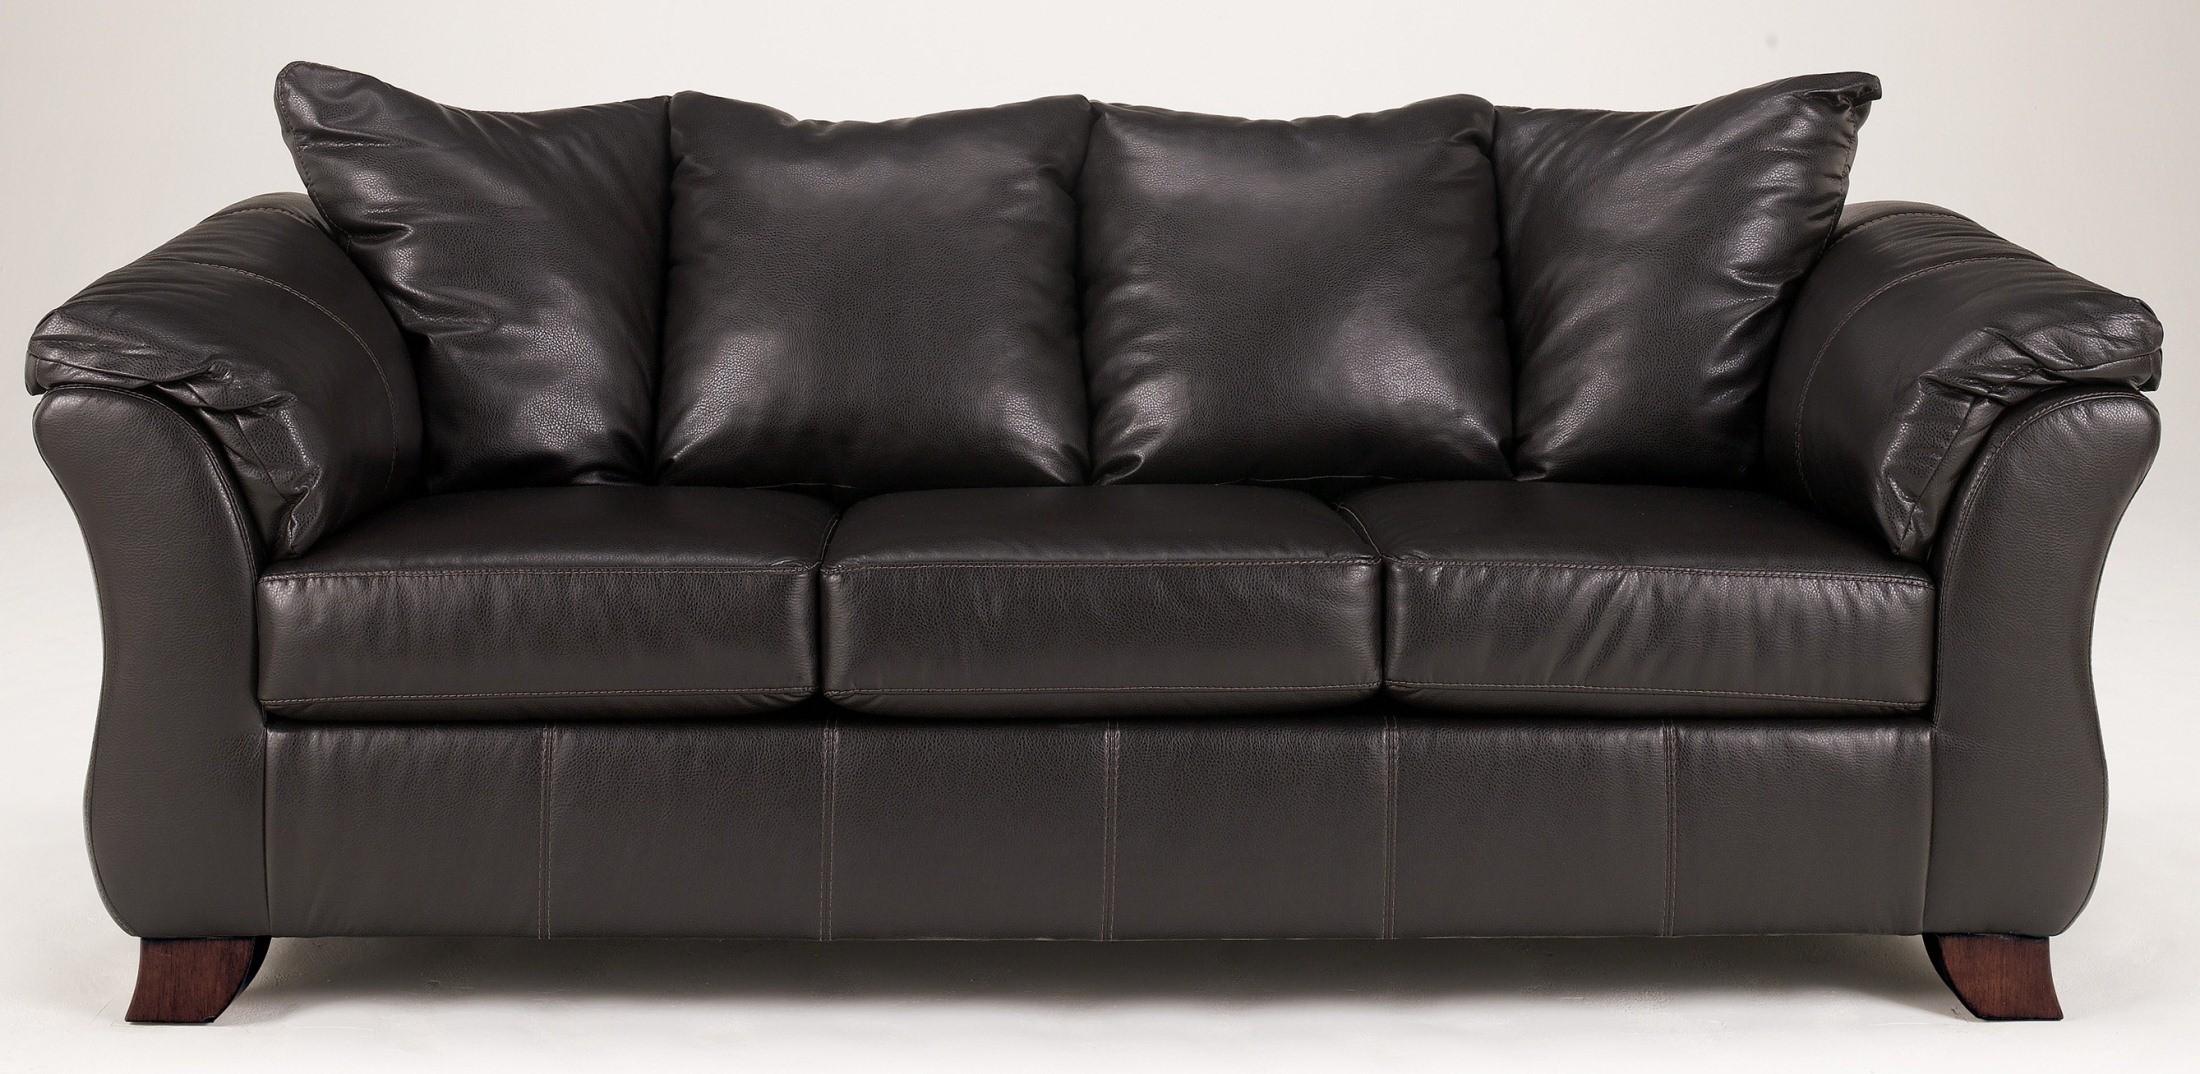 San marco durablend chocolate sofa 1500138 ashley furniture for Ashley san marco chaise